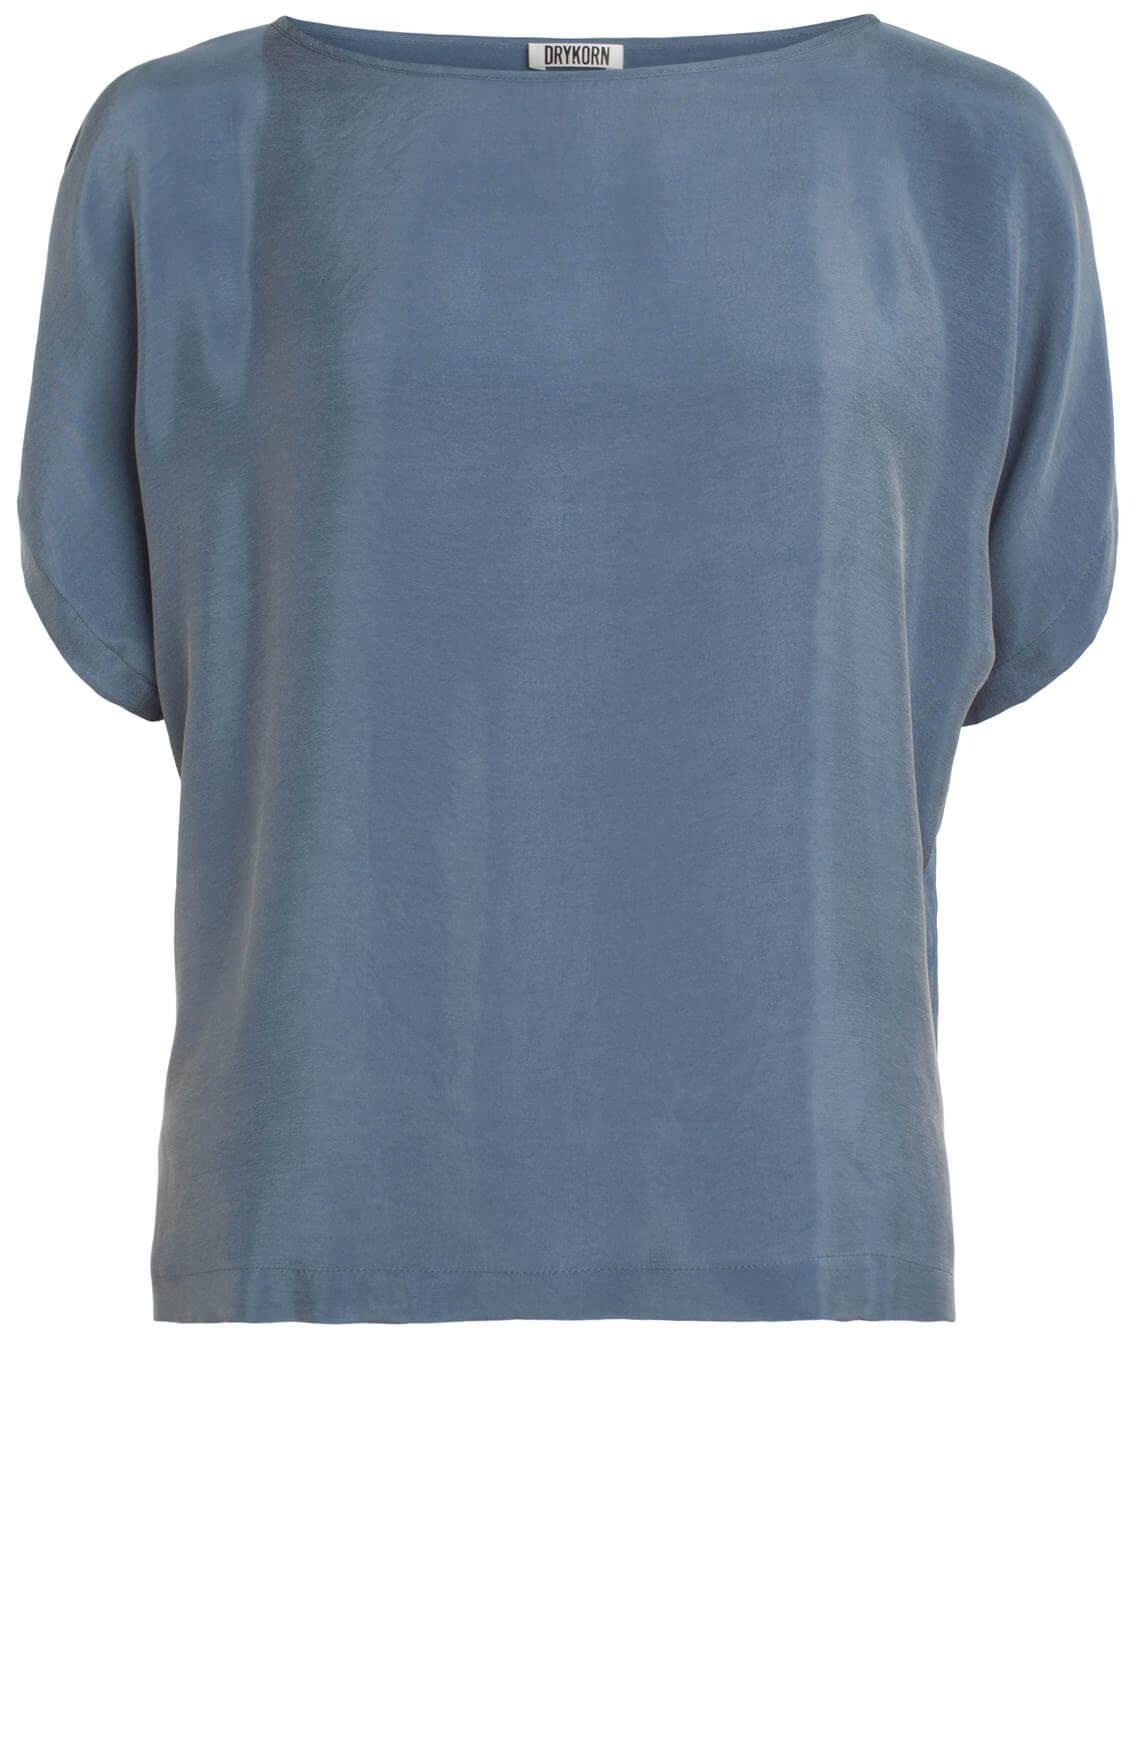 Drykorn Dames Somia chique blouse grijsblauw Blauw